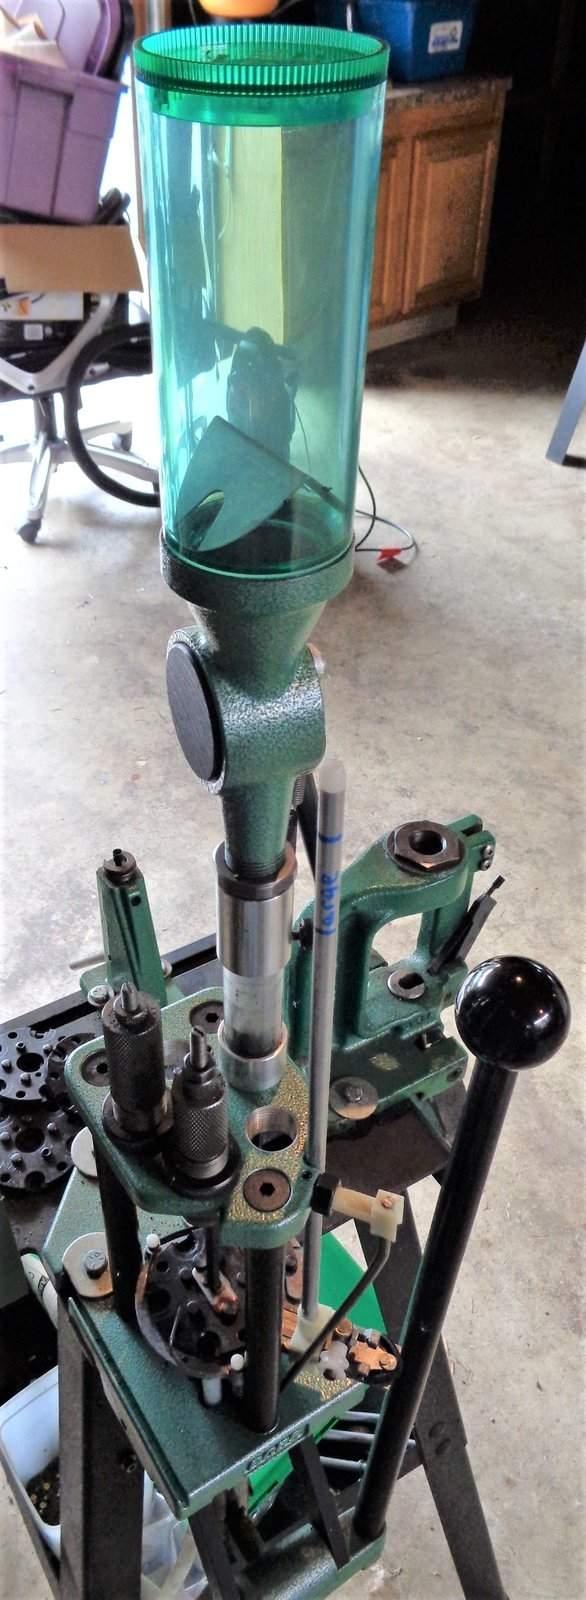 WTS WA - RCBS Ammomaster Auto Progressive Reloading Press